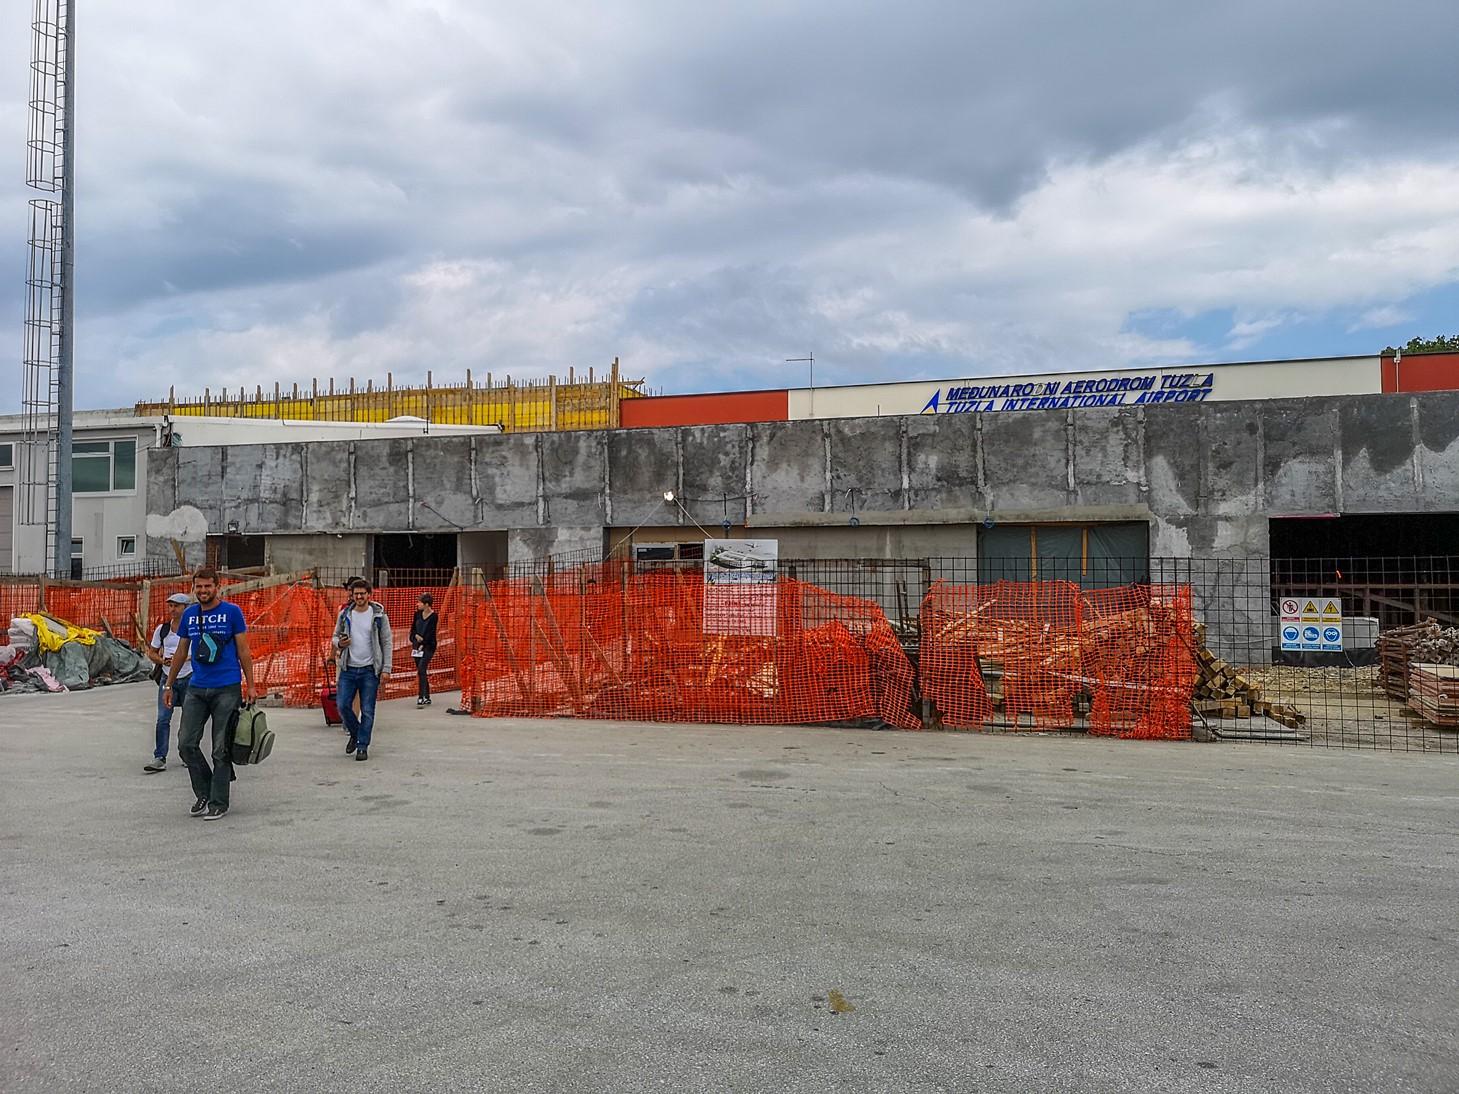 Scary Tuzla international airport